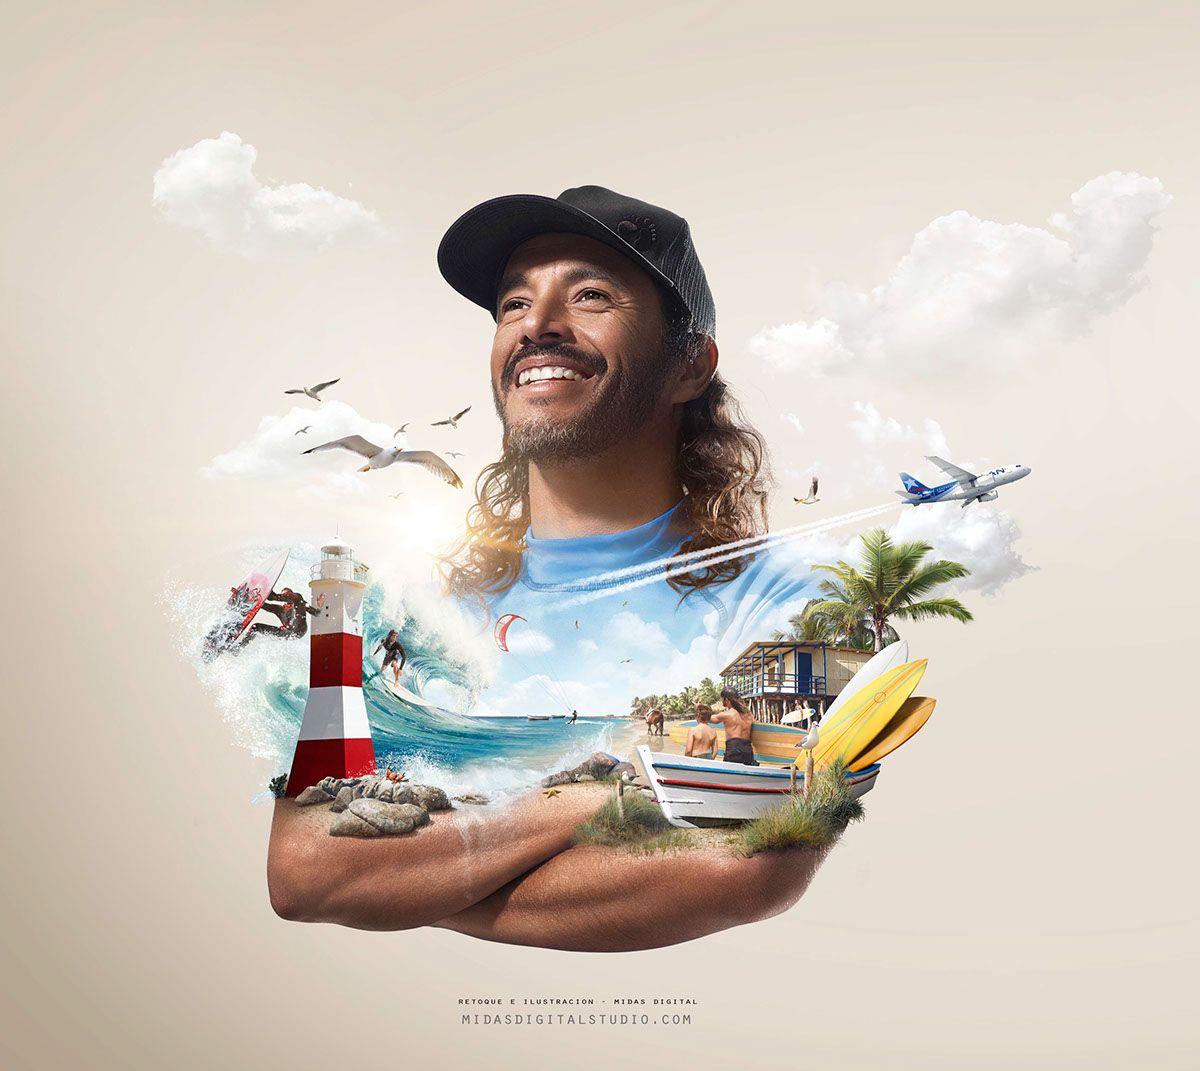 Amazing Worker: Amazing Photo Manipulation Work By Midas Digital Studio